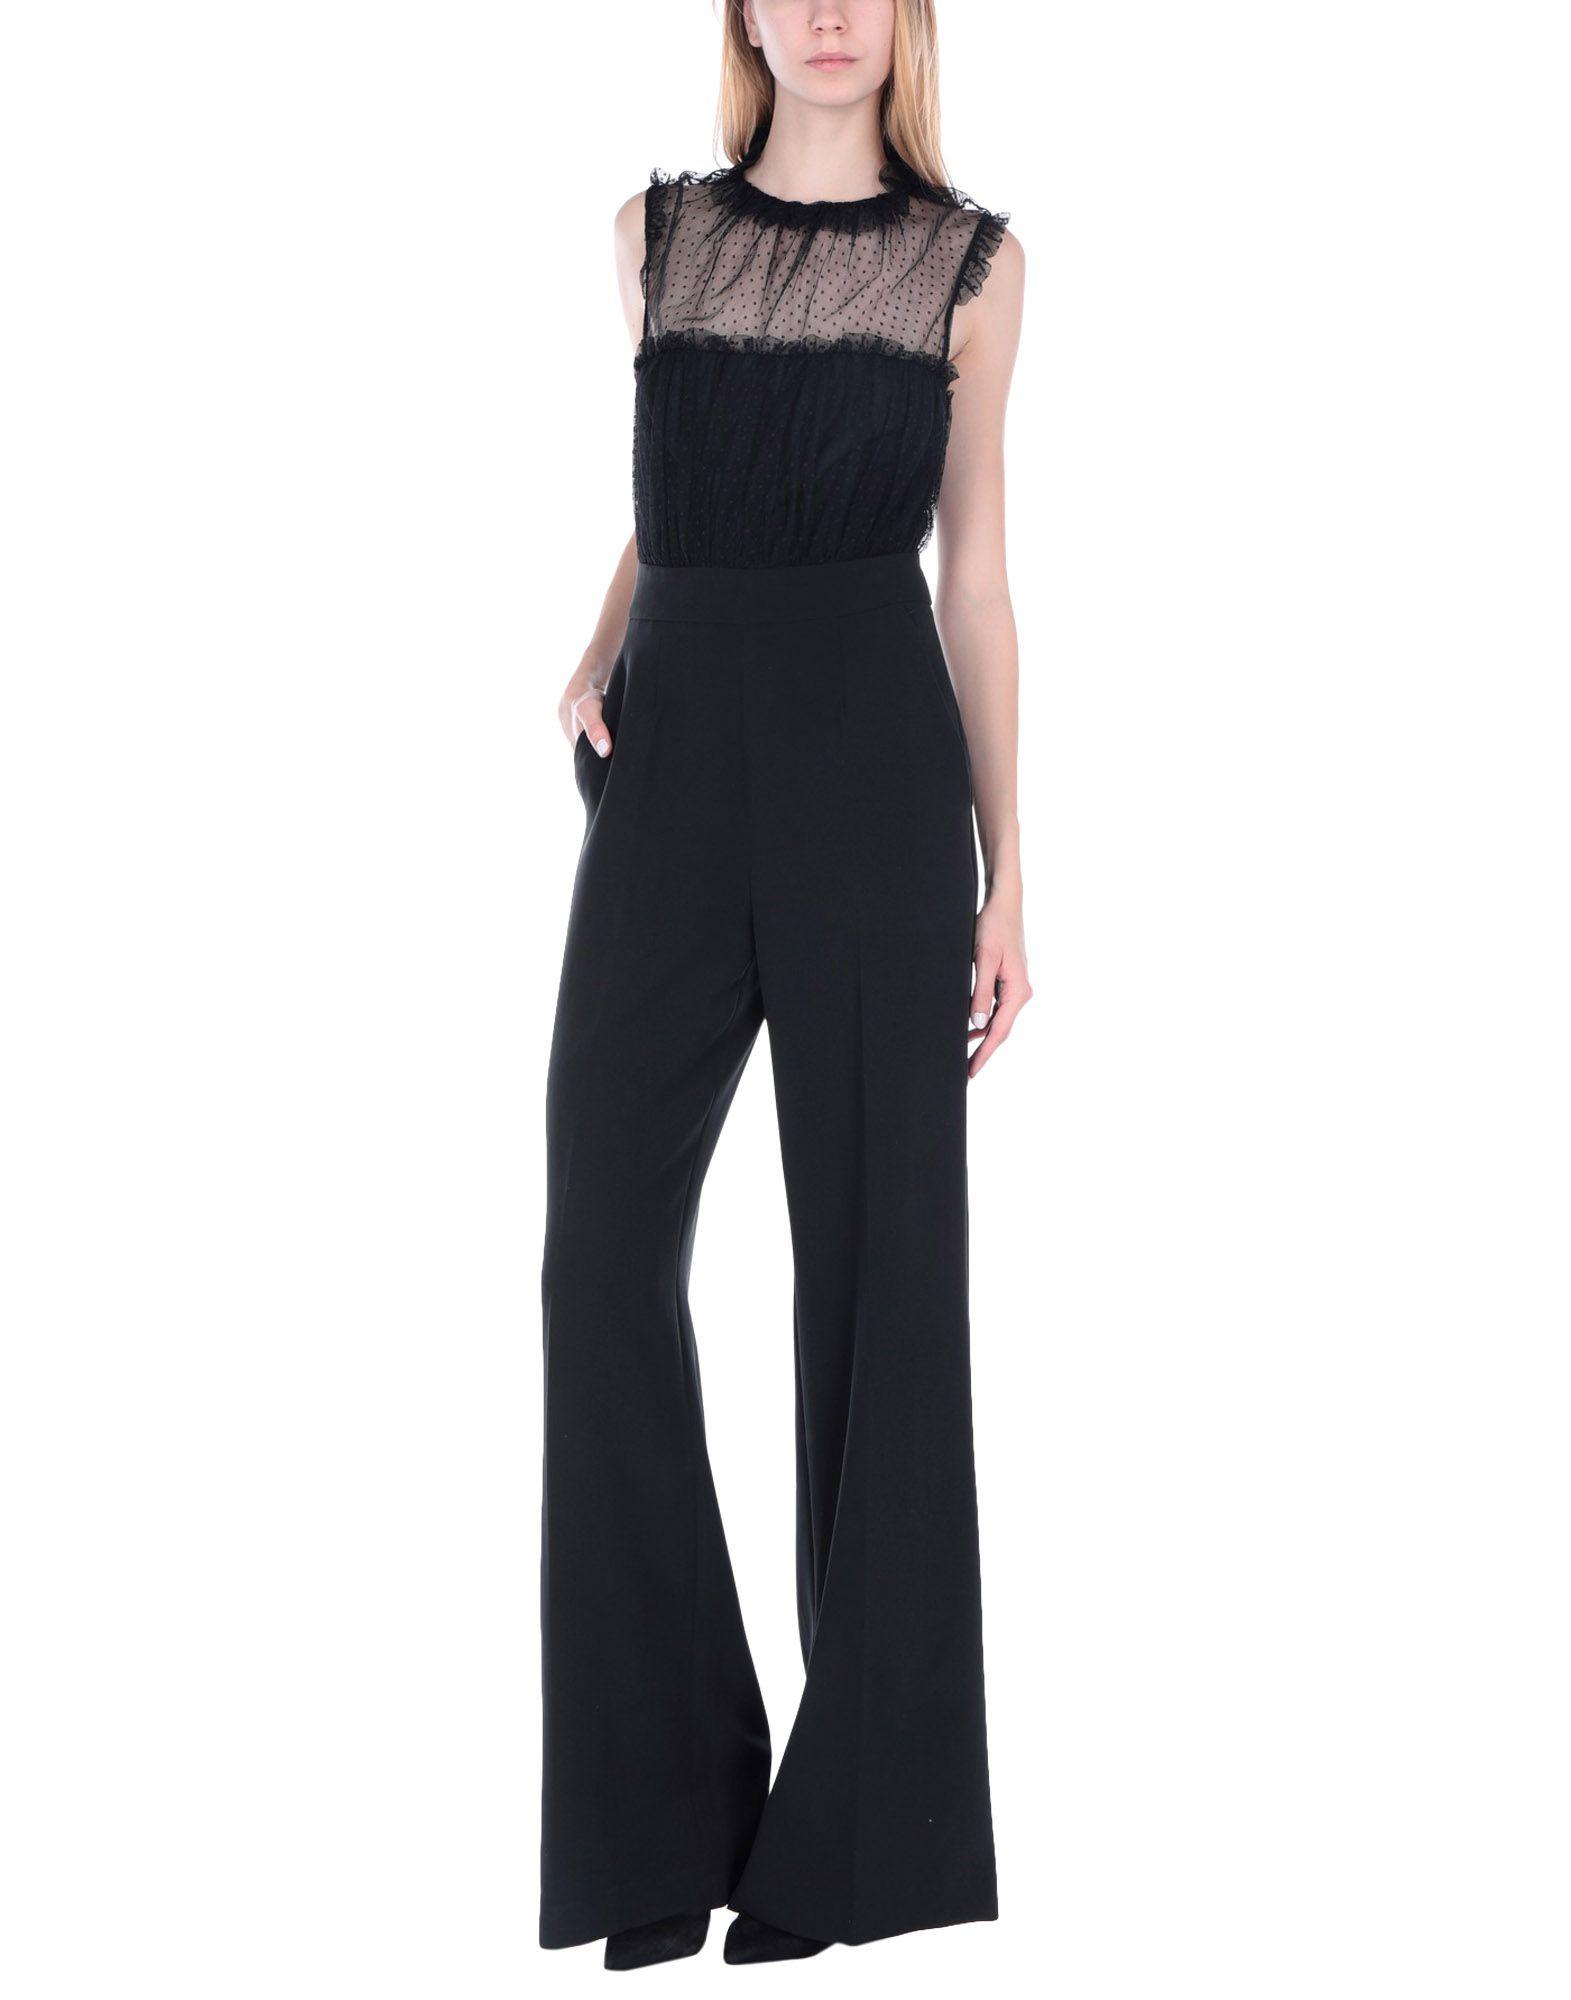 Фото - IT'S A PARTY DRESS Комбинезоны без бретелей black sexy mesh stitching swing party dress